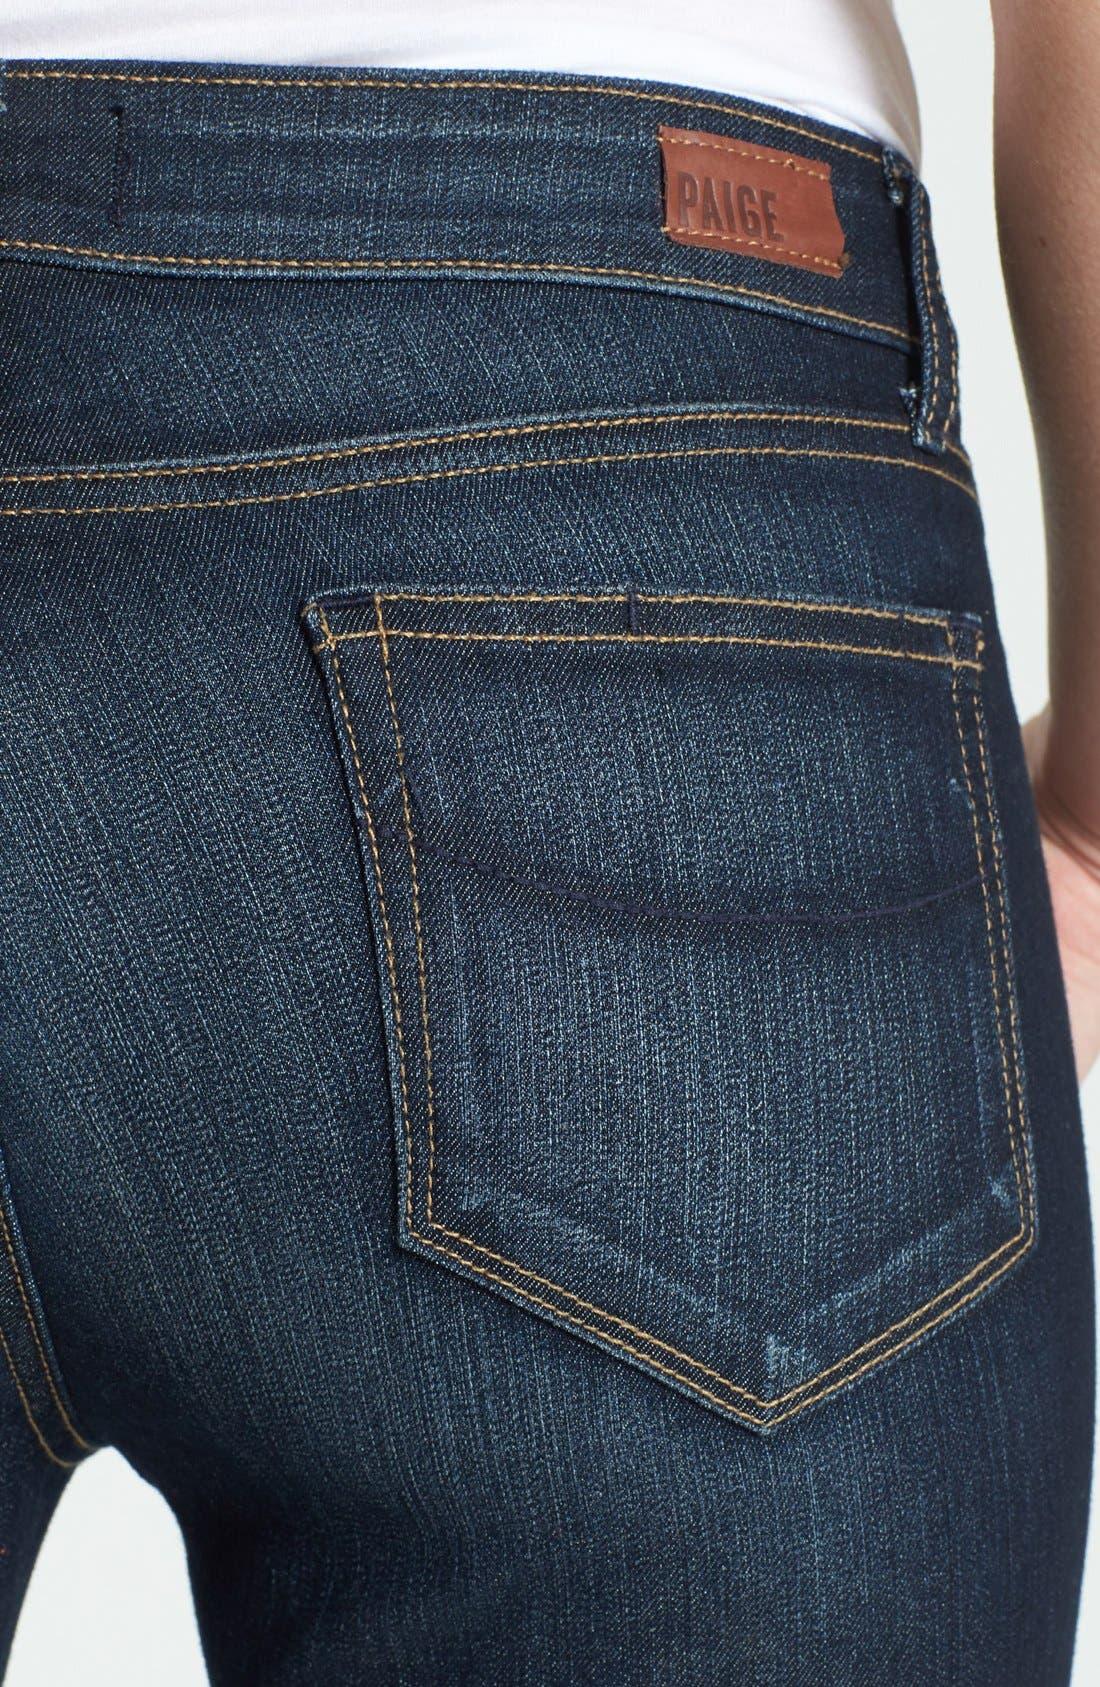 Alternate Image 3  - Paige Denim 'Verdugo' Skinny Ankle Jeans (Moonrise)